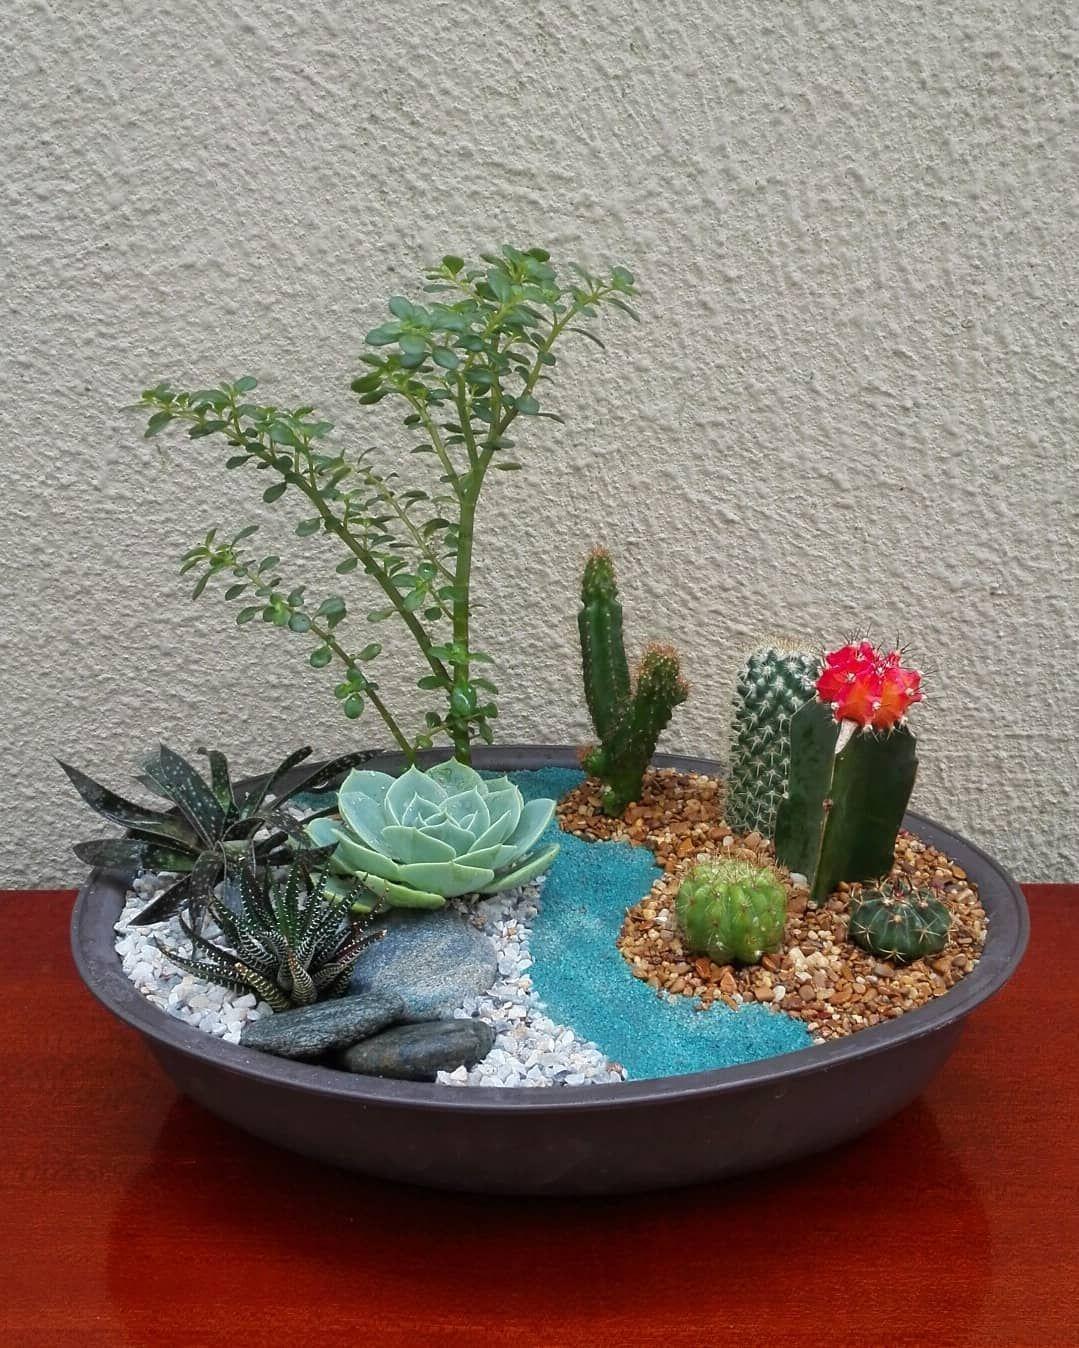 11 Mini jardines de cactus en macetas